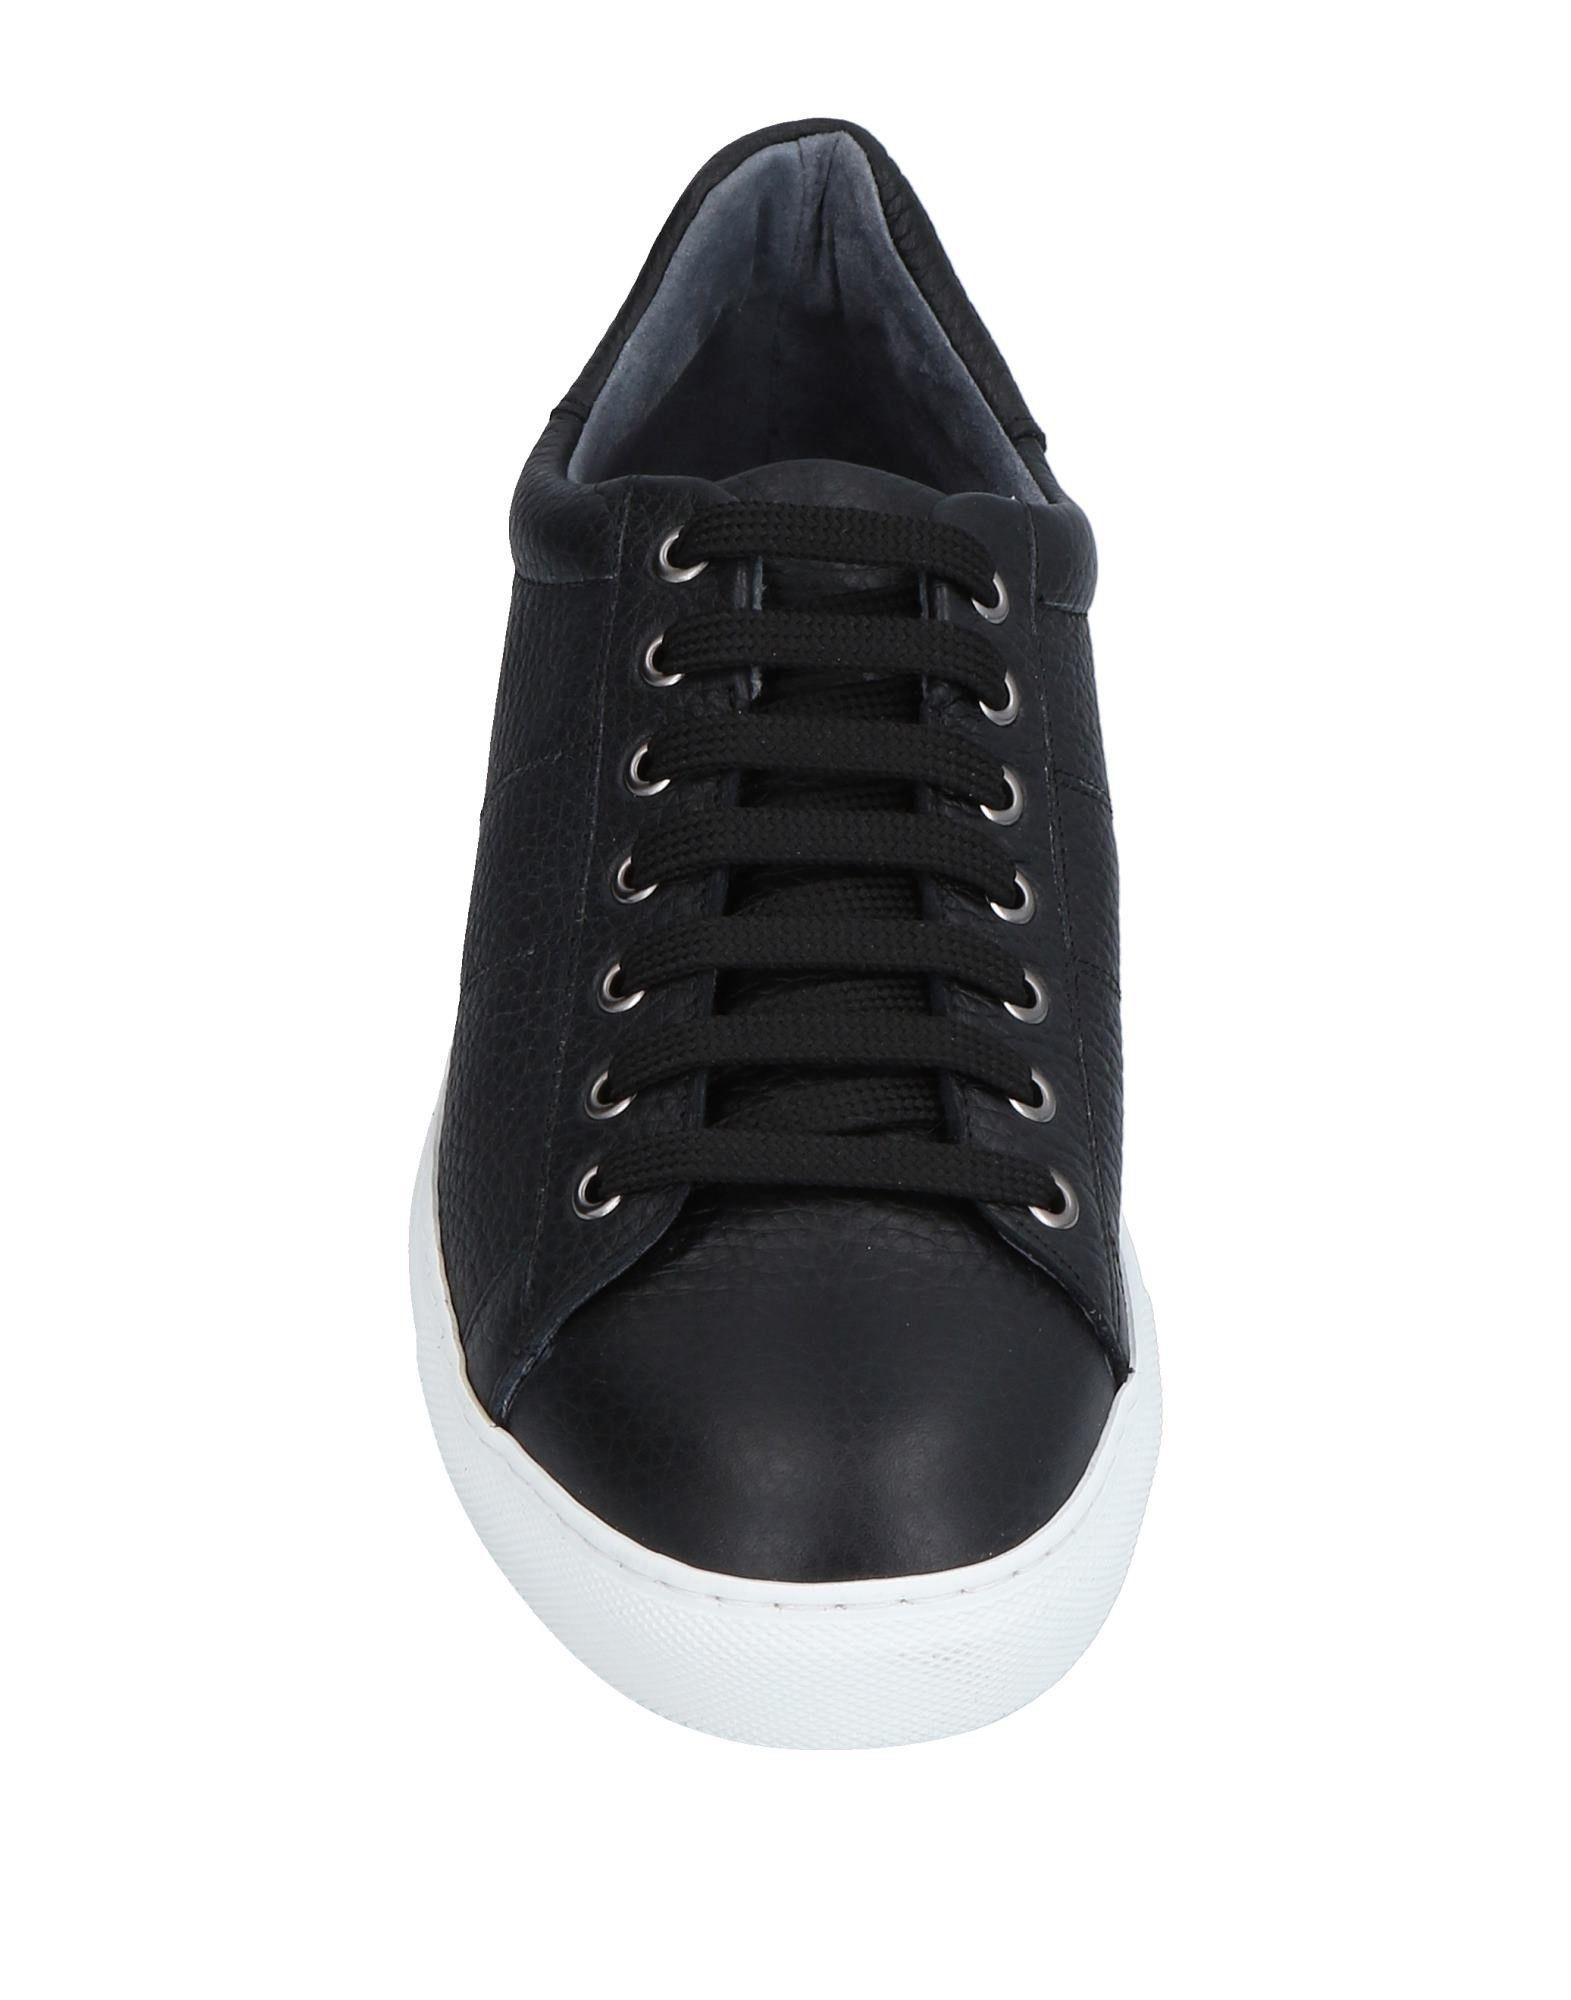 Tsd12 Tsd12  Sneakers Herren  11504113PX b7be9d